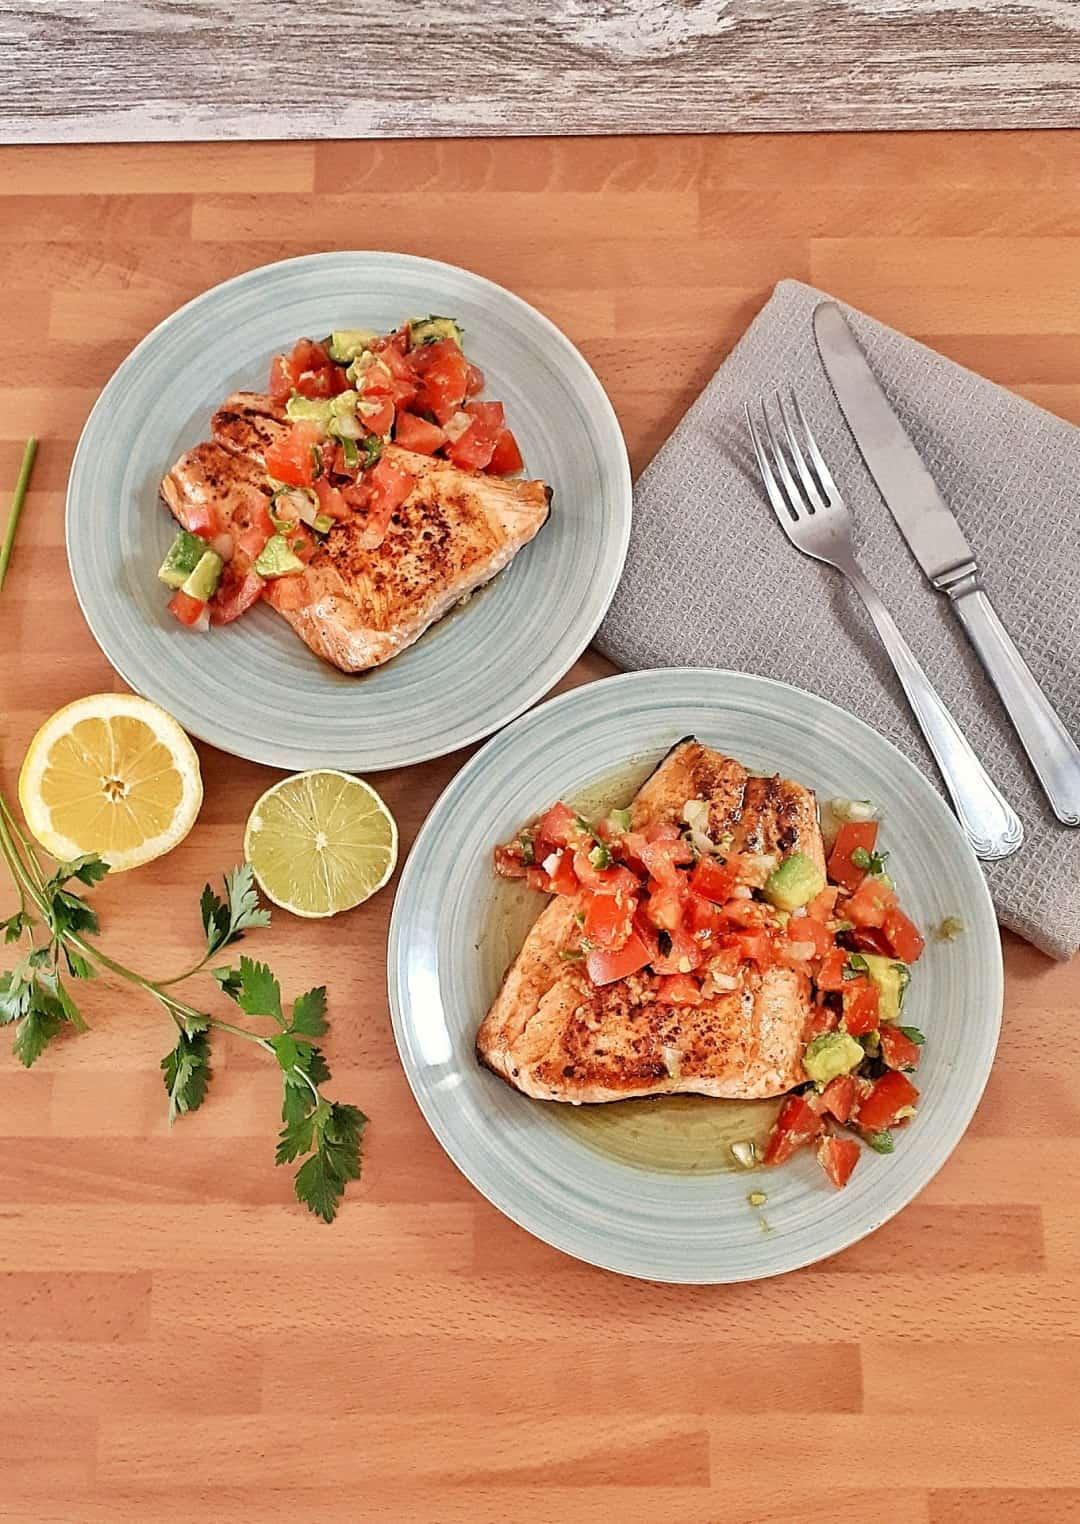 Seared Salmon with Tomato & Avocado Salsa - Keto & Low-Carb